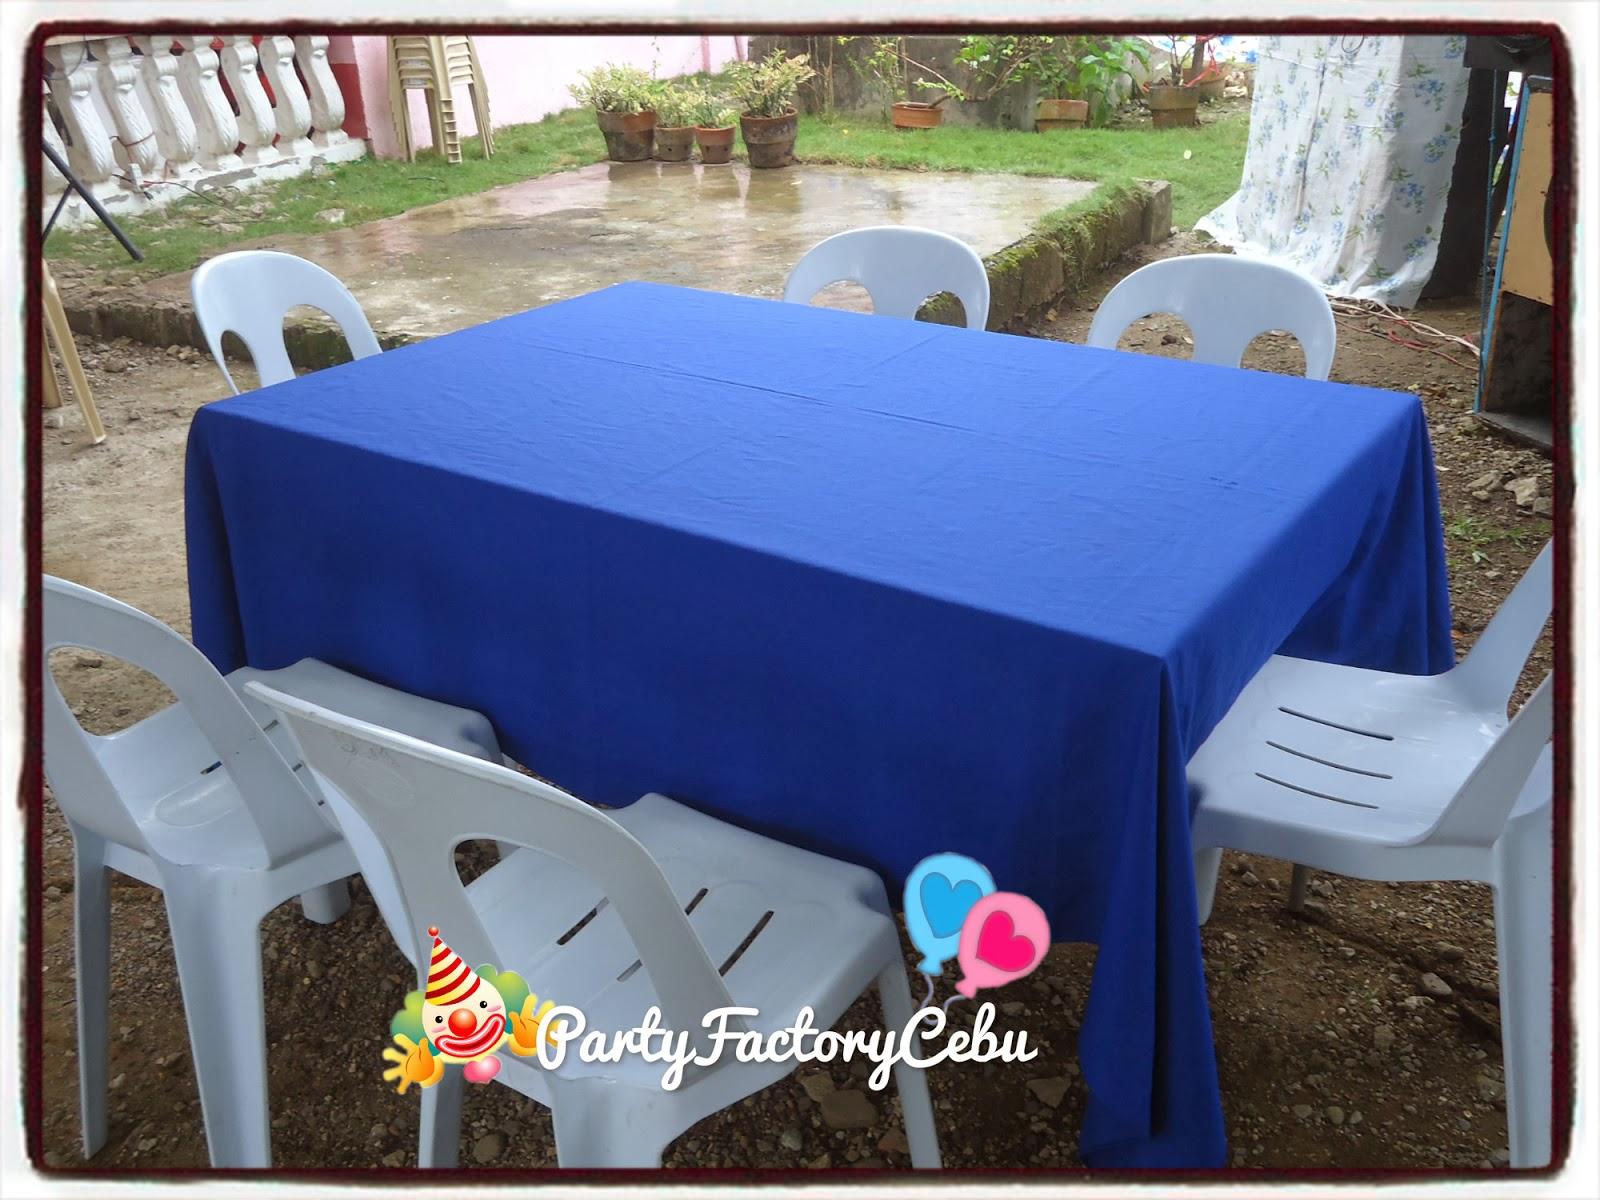 Welcome To Partyfactory Cebu February 2014